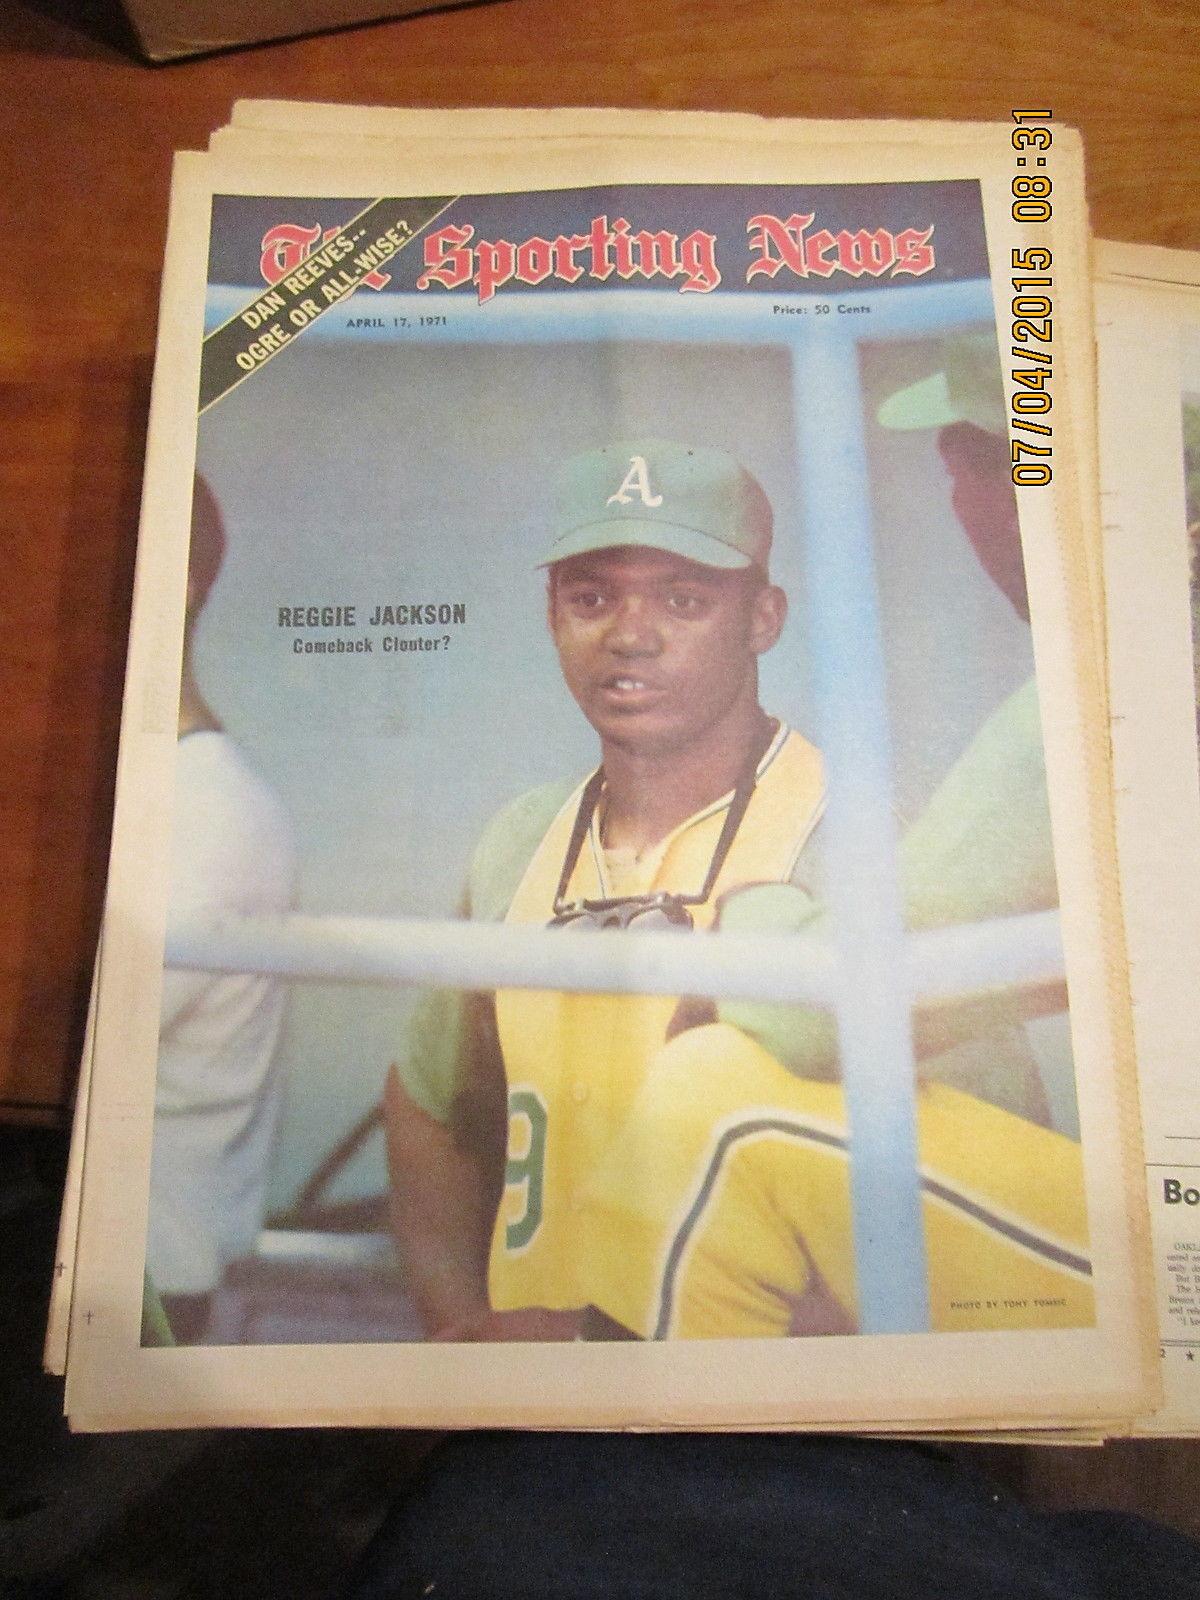 4/17 1971 The Sporting News Reggie Jackson Oakland A's